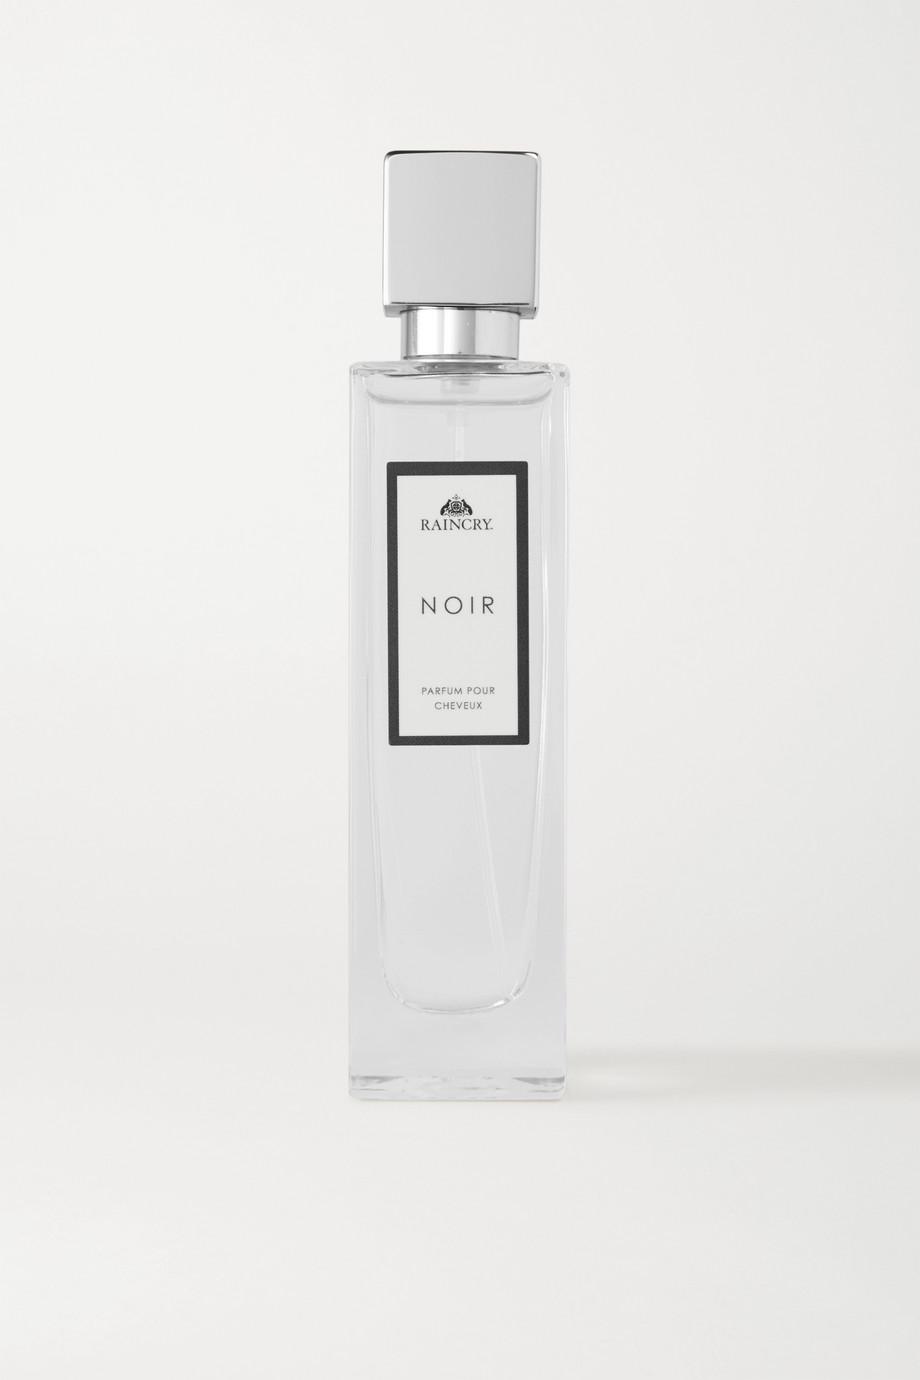 RAINCRY Advanced Hair Mist Noir - Powdered Pomelo, 50ml